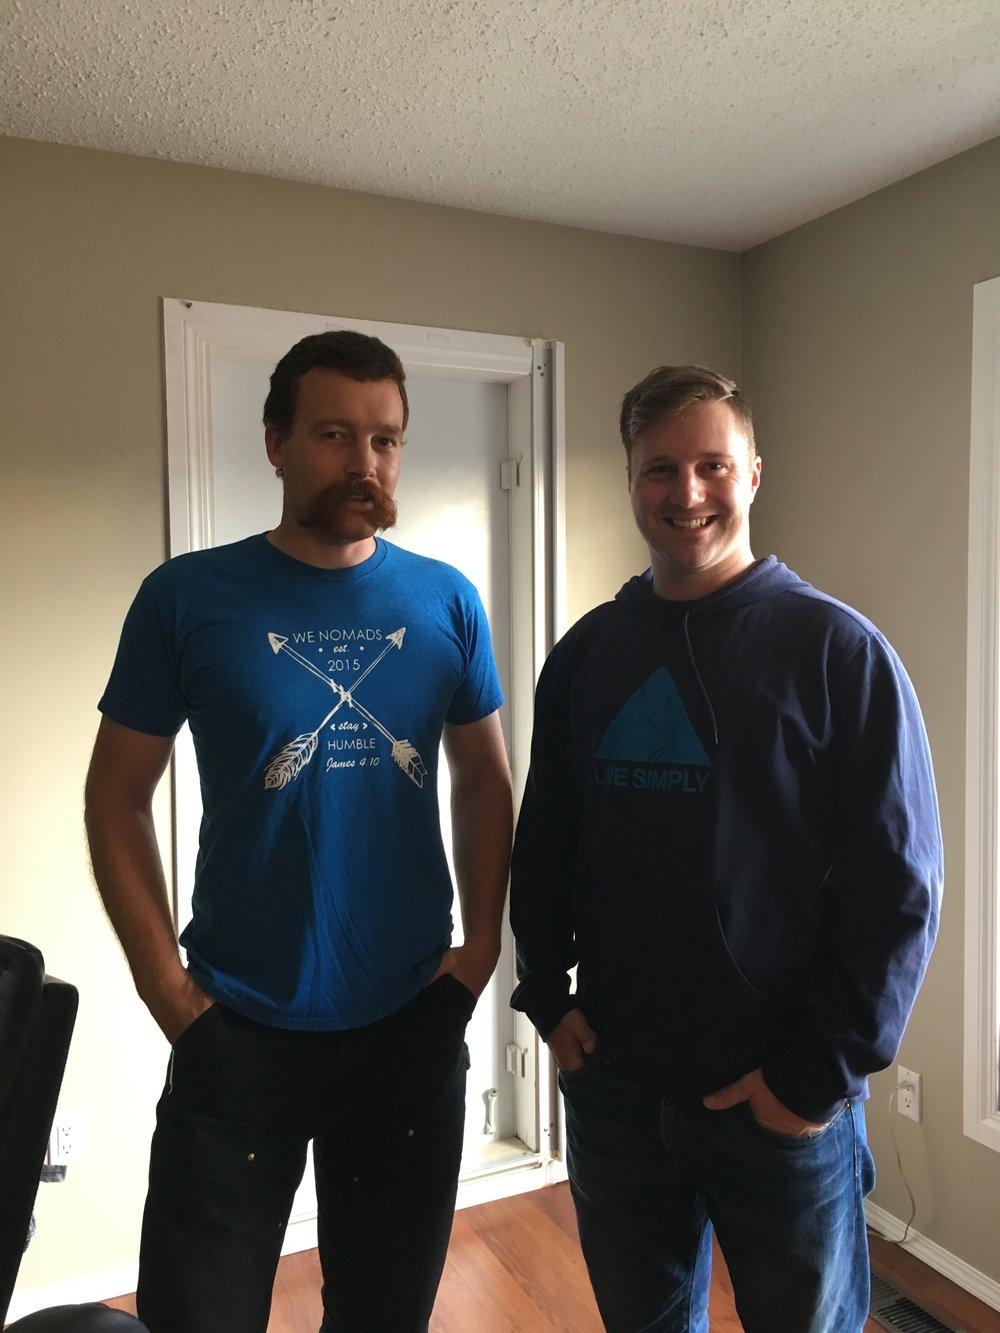 Luke gave John a new WeNomad shirt to wear!